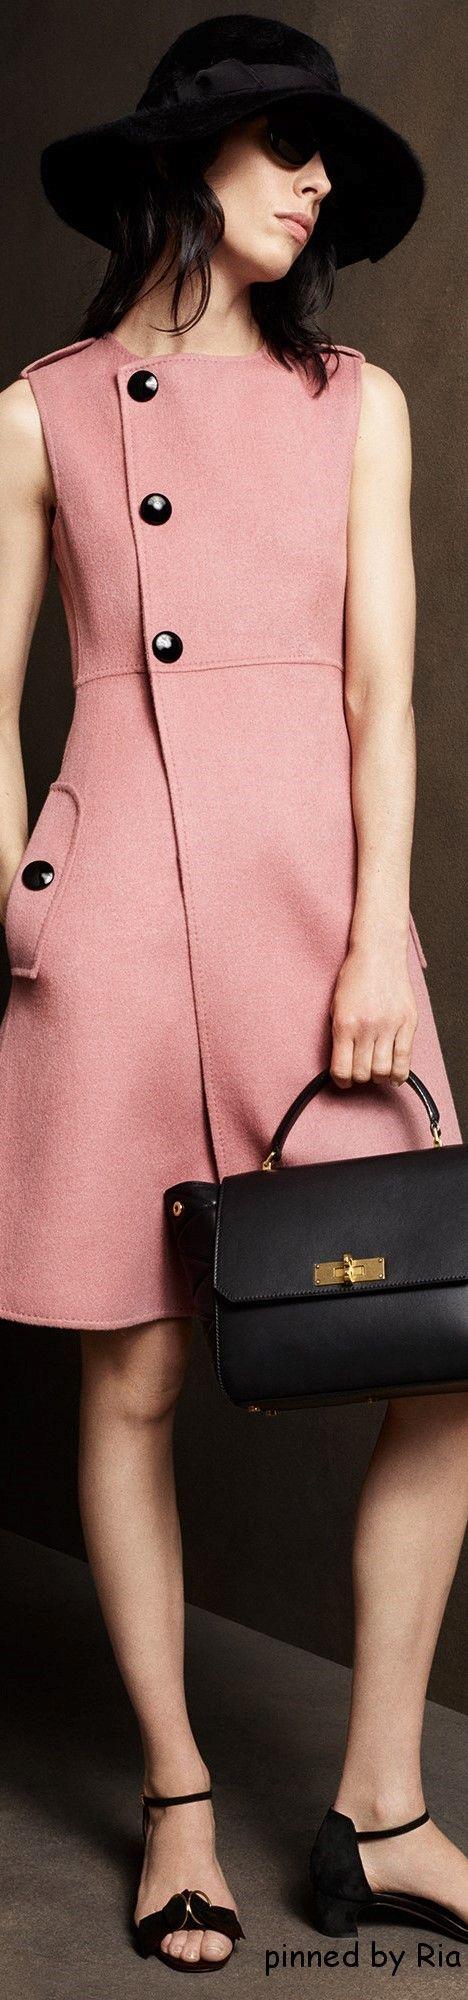 vestido tapado manga corta sobrero negro de color rosa